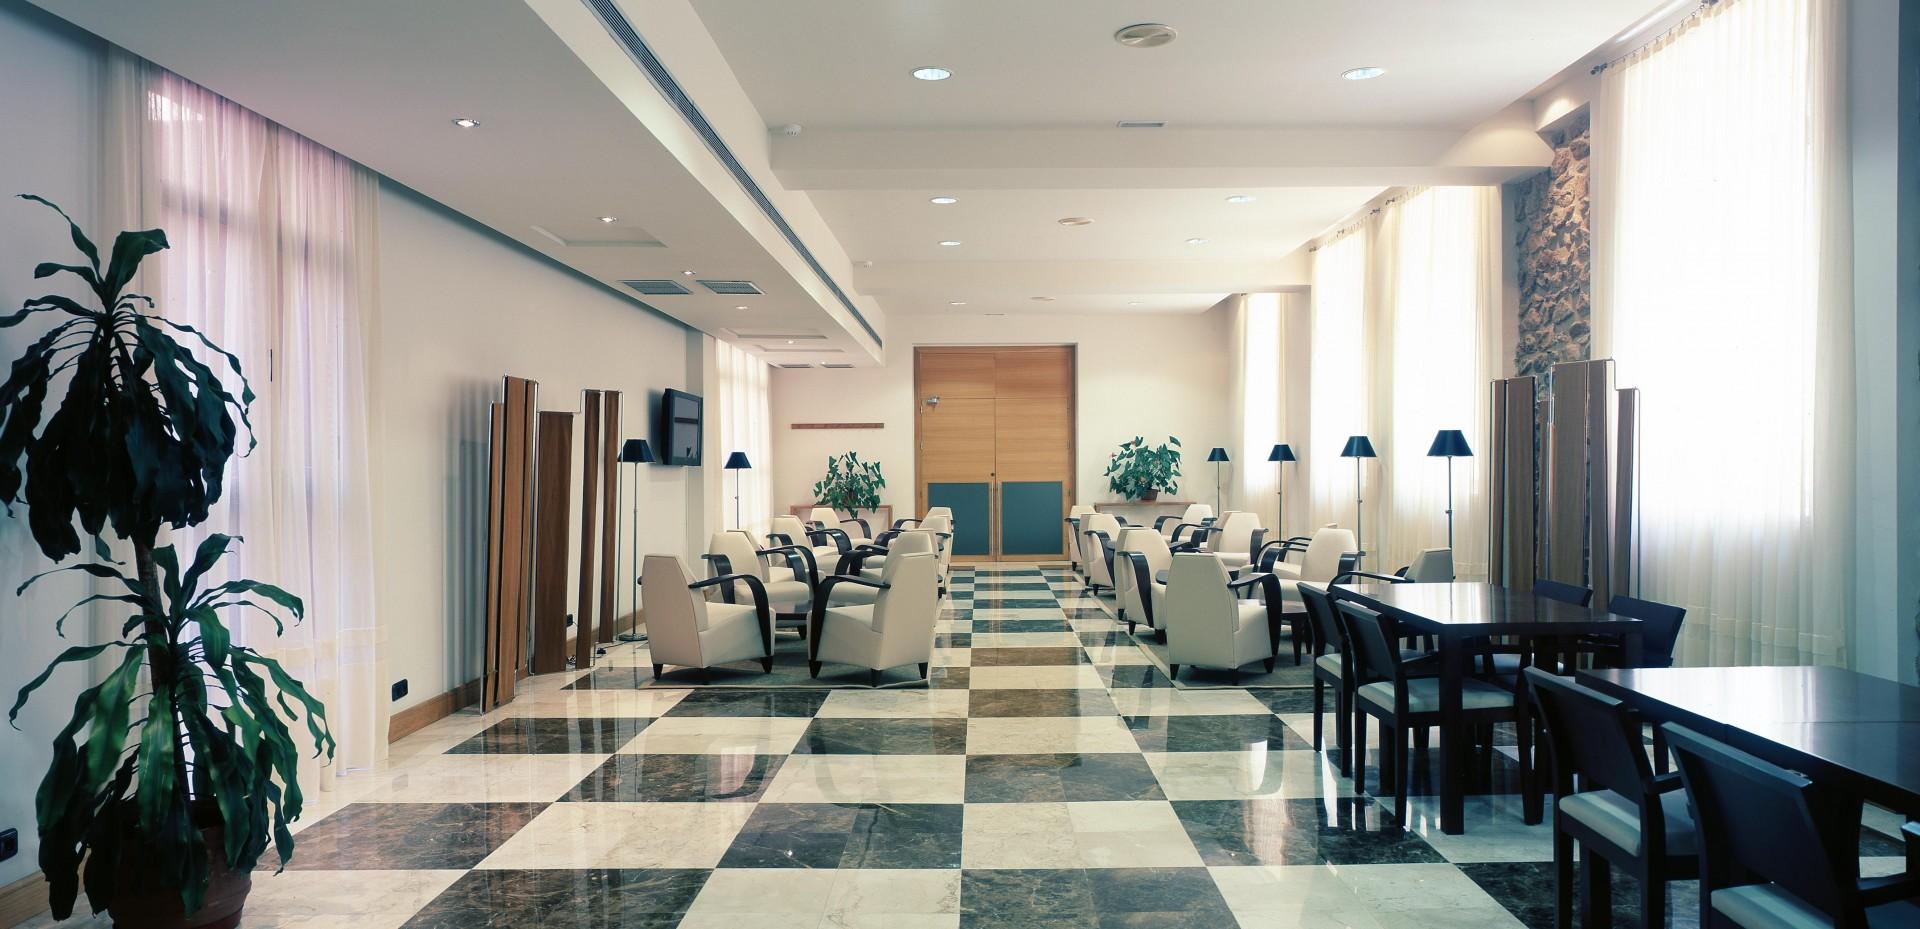 Fotos hotel levante balneario de archena 11